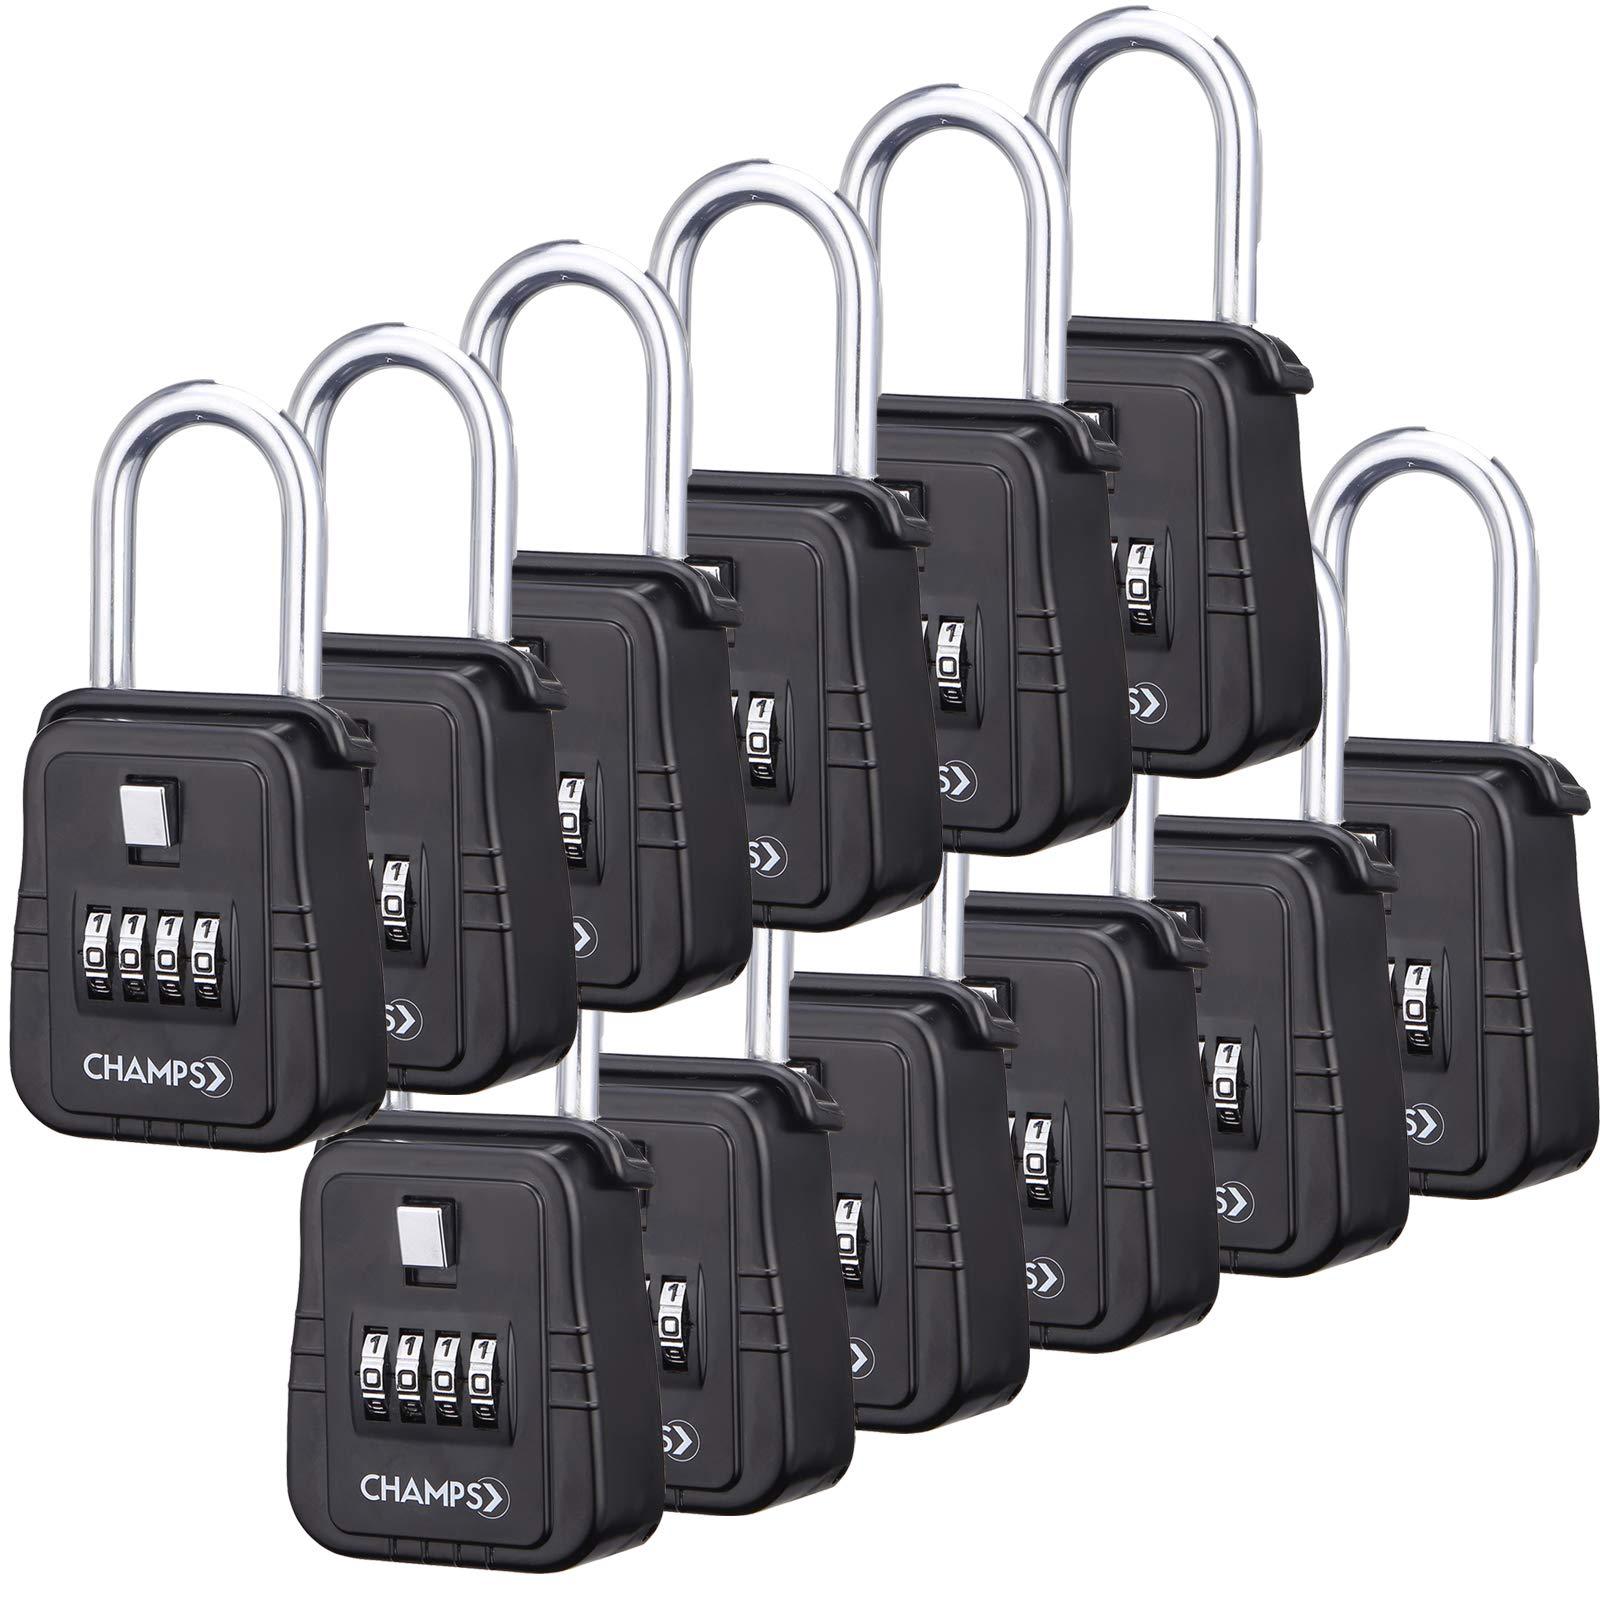 Champs Combination Realtor Lock, 4 Digit Comination Padlock, Real Estate Key Lock Box, Set-Your-Own Combination [12 Packs, Black]